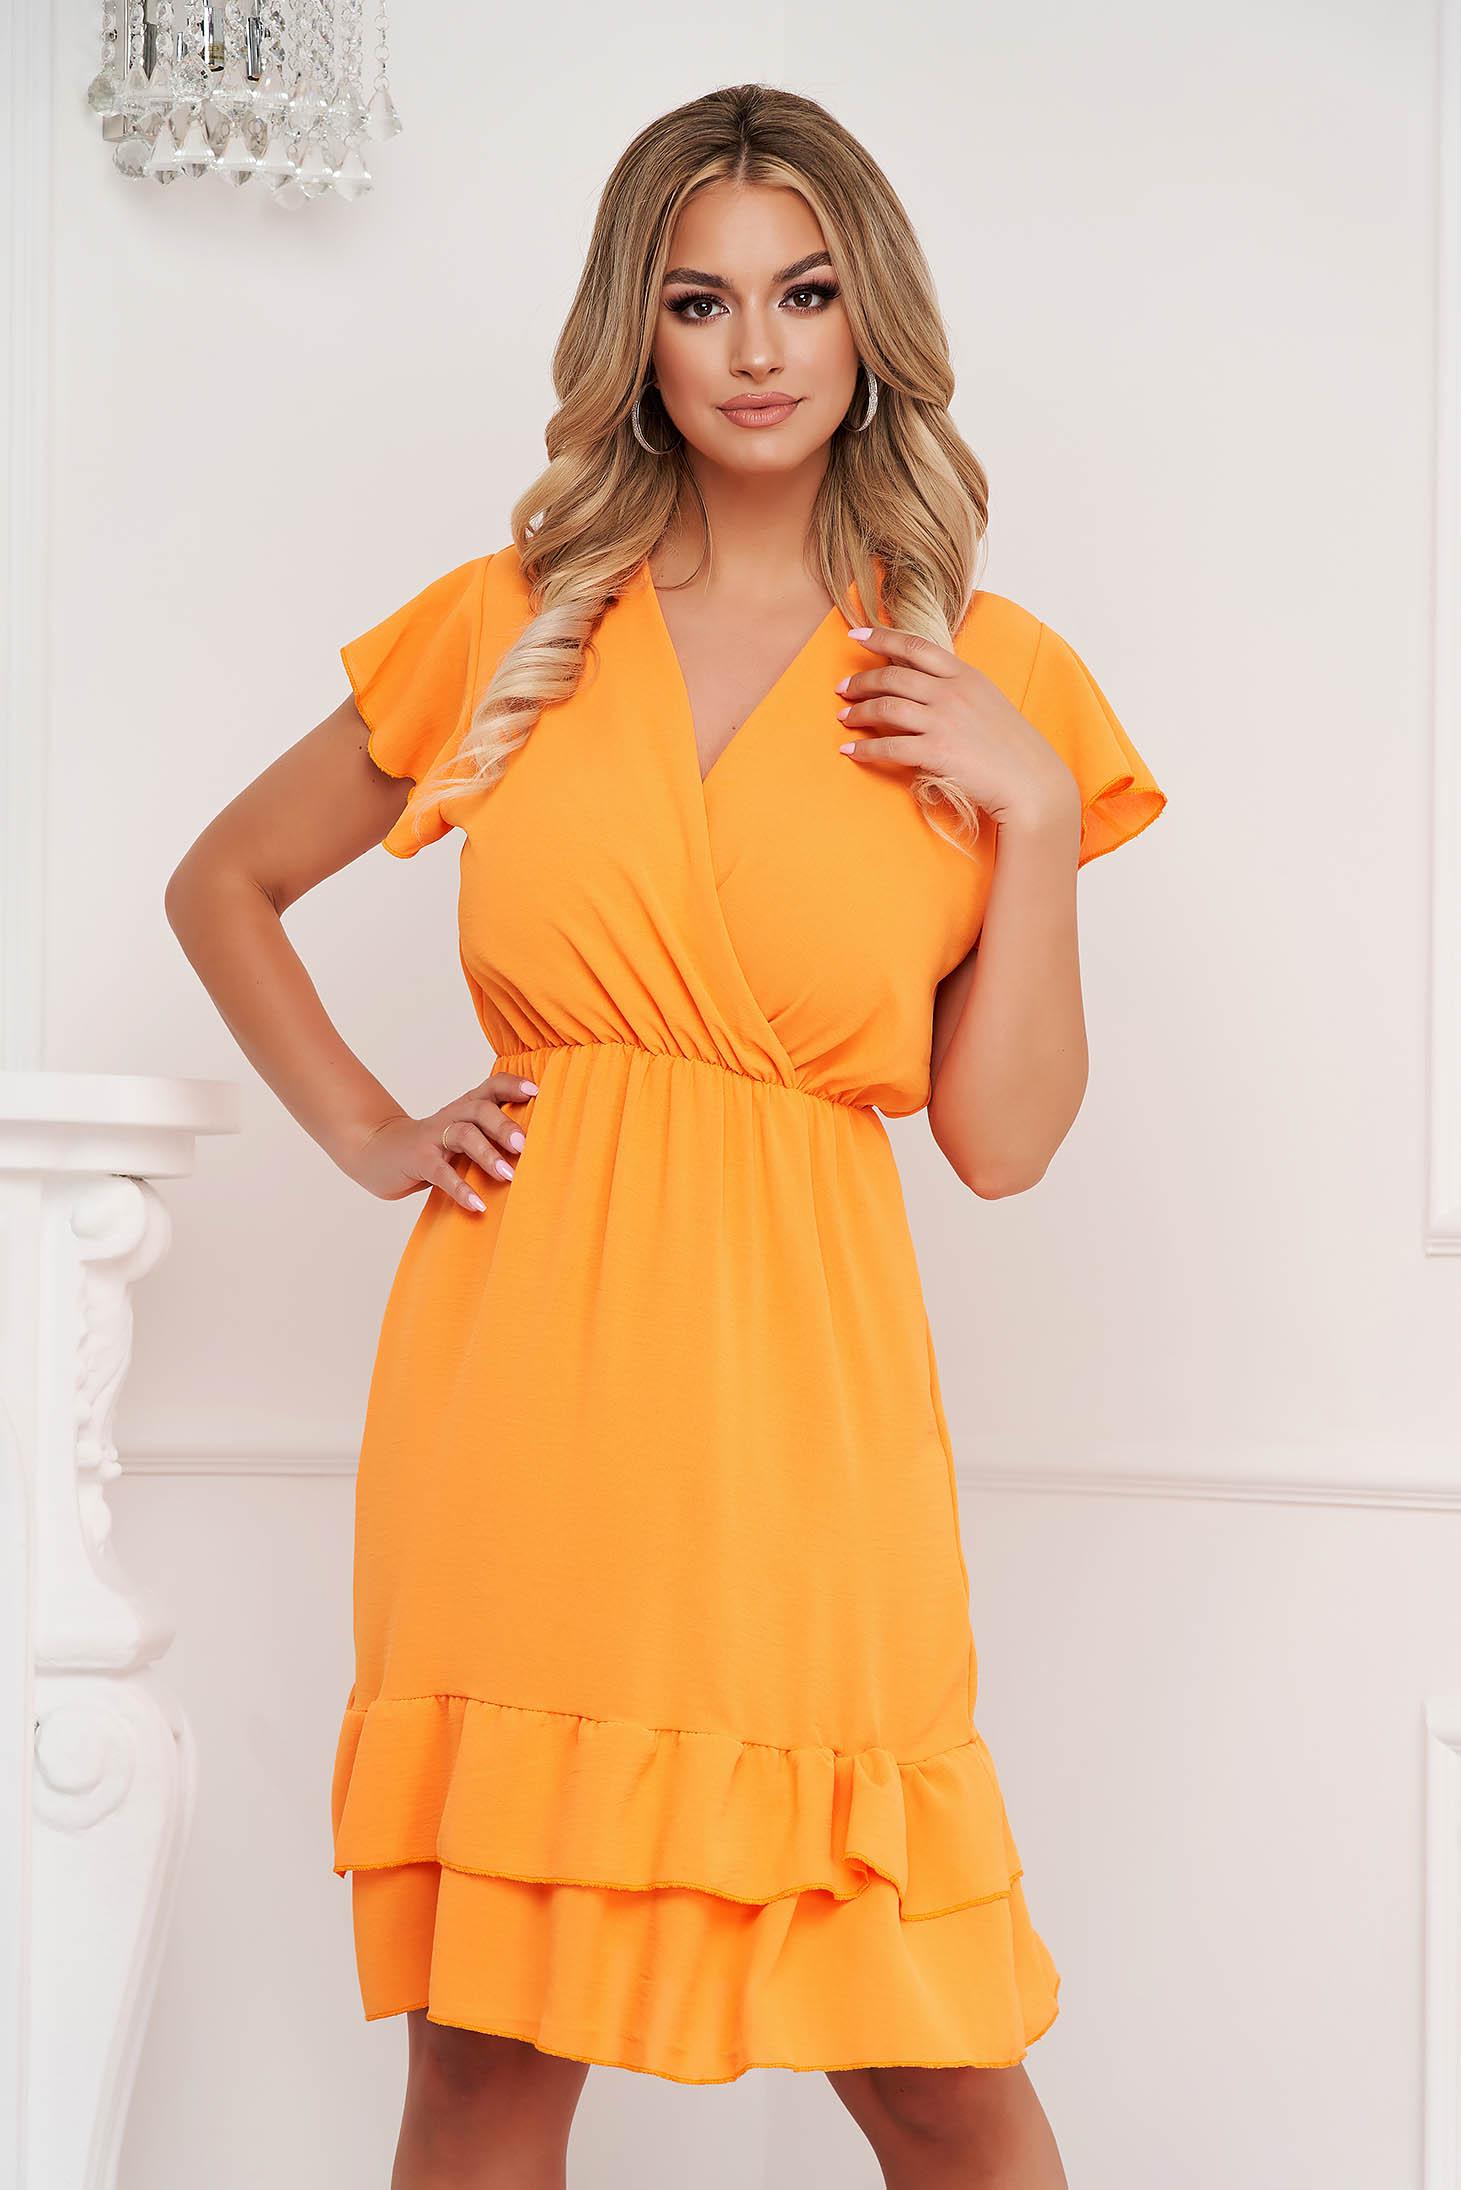 Rochie Lady Pandora portocalie midi in clos cu elastic in talie din material vaporos cu volanase